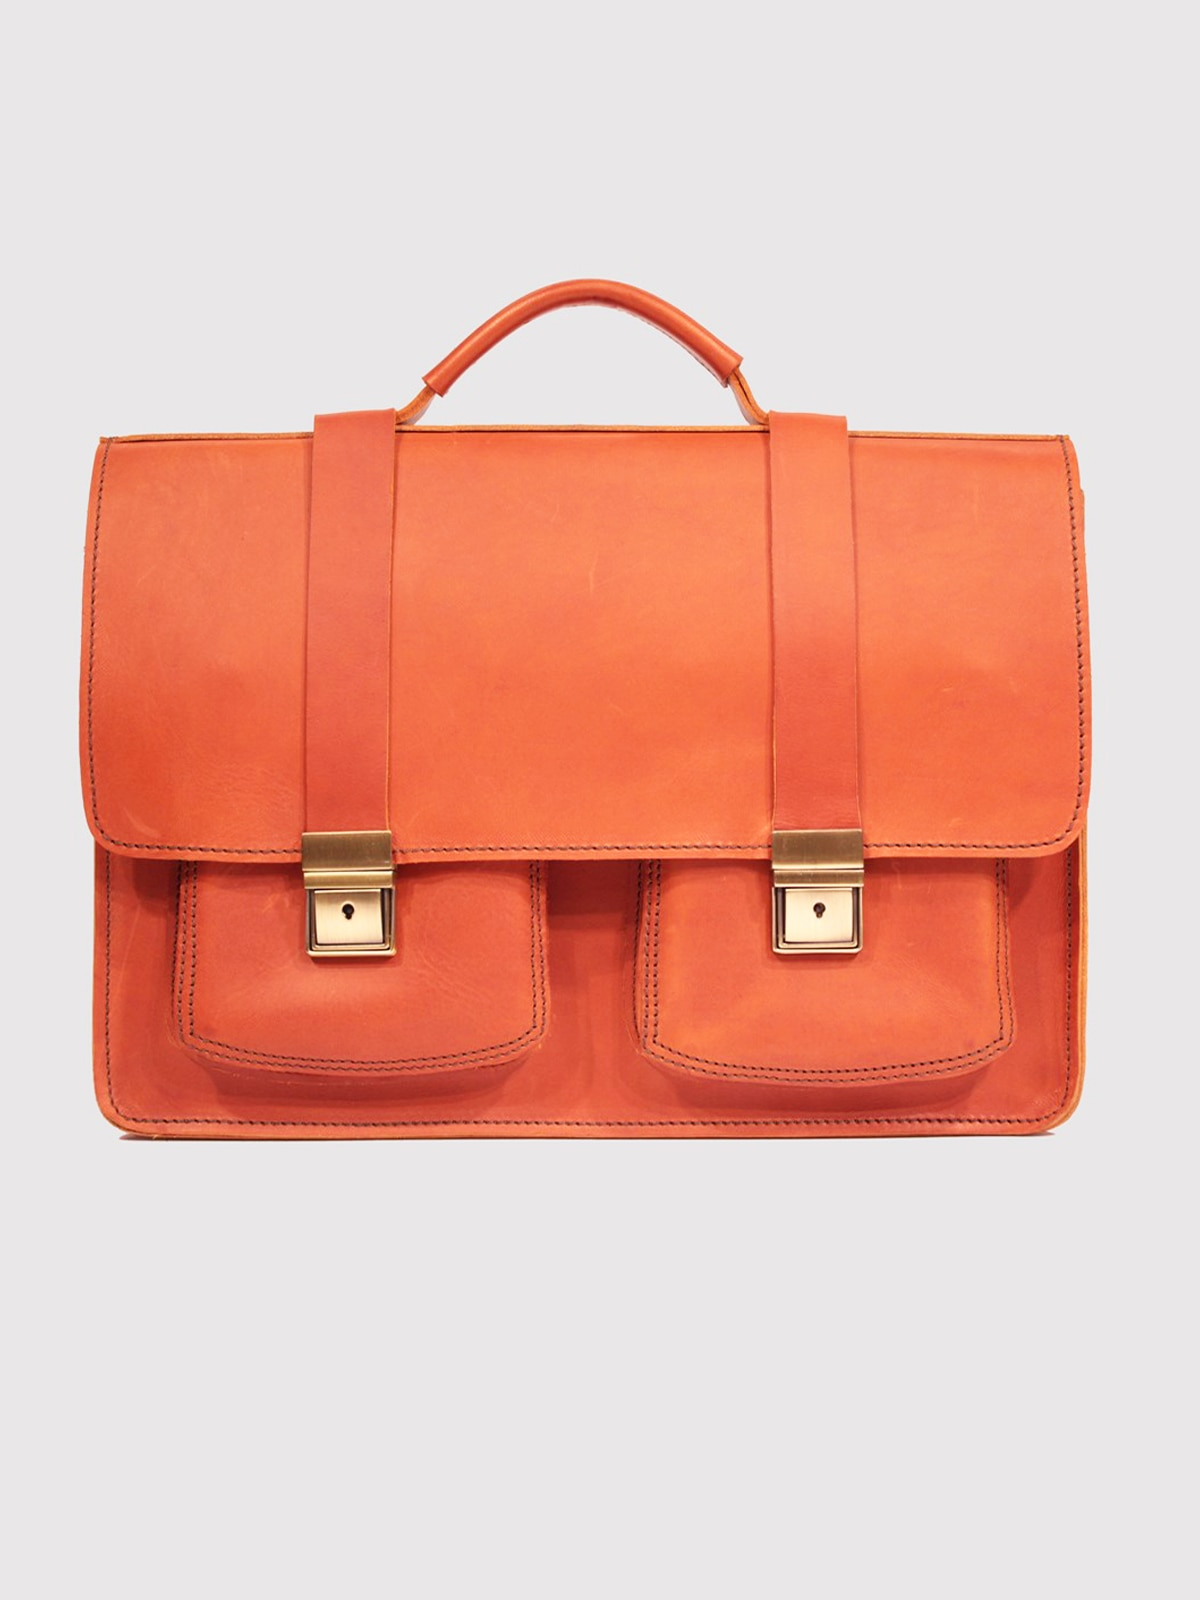 Leather Briefcase Genuine Bag For Documents Men Women Teens Organizer Laptop B